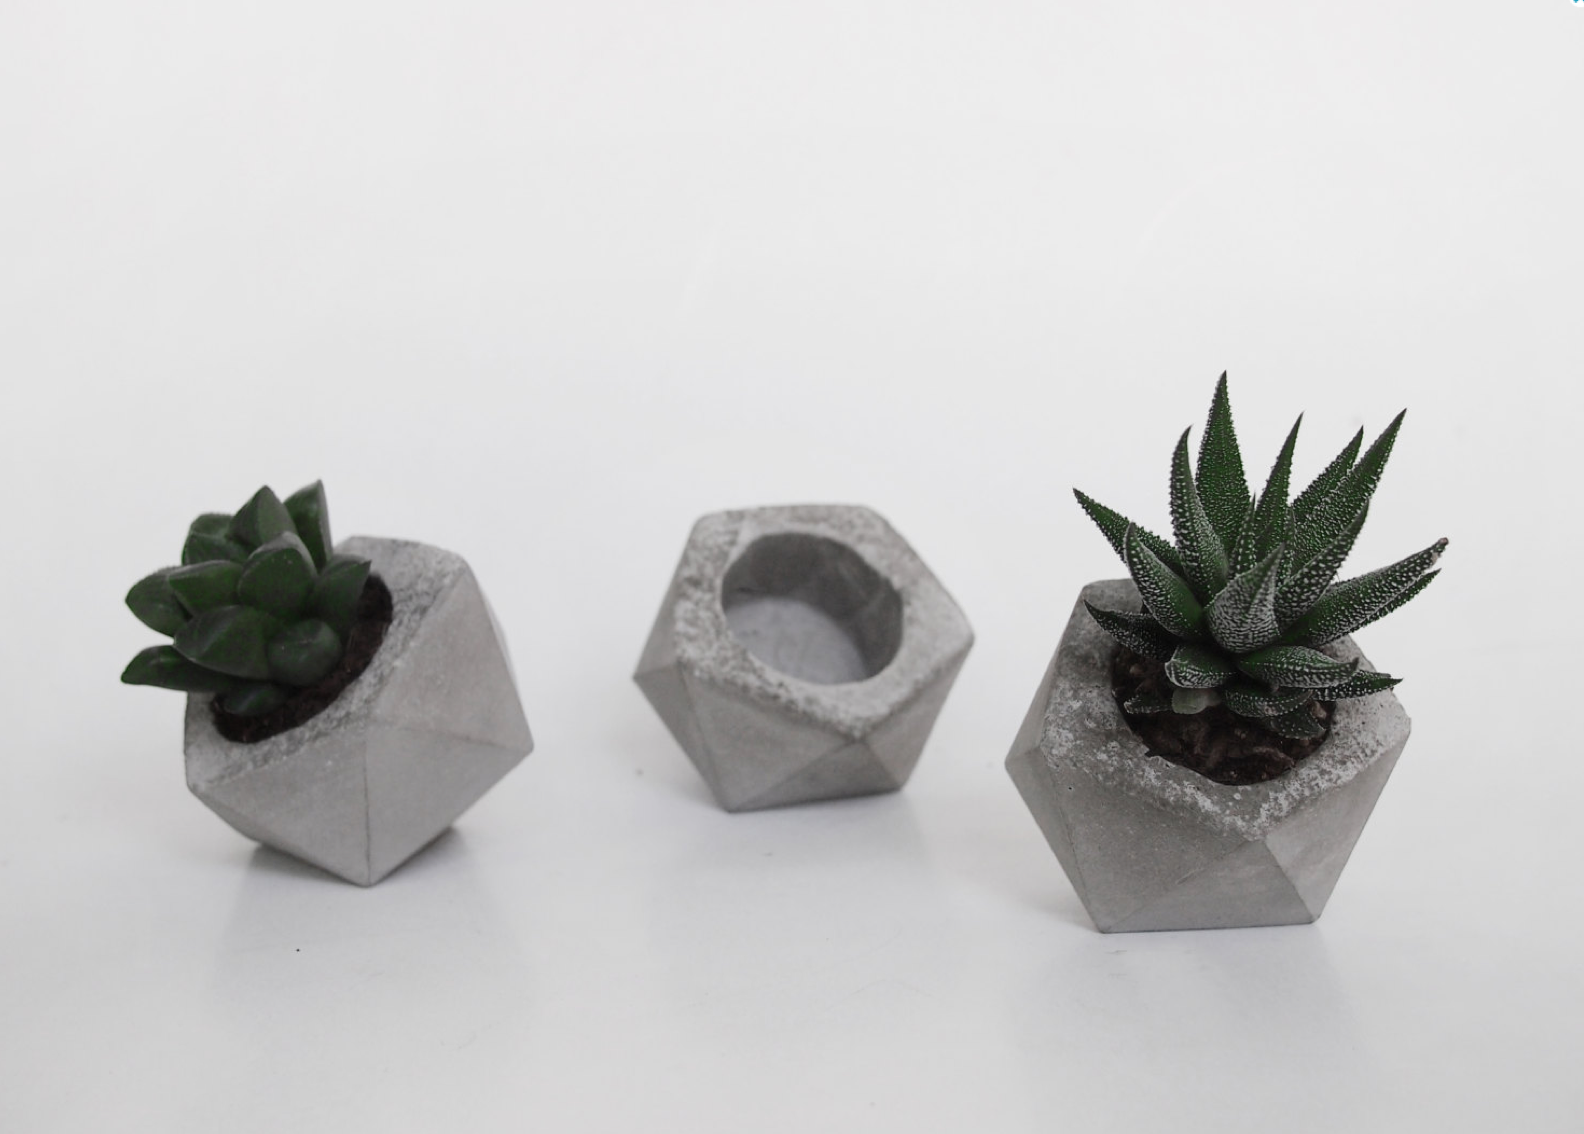 https://www.etsy.com/au/listing/184290692/small-concrete-planter-handmade-cachepot?ref=shop_home_active_14